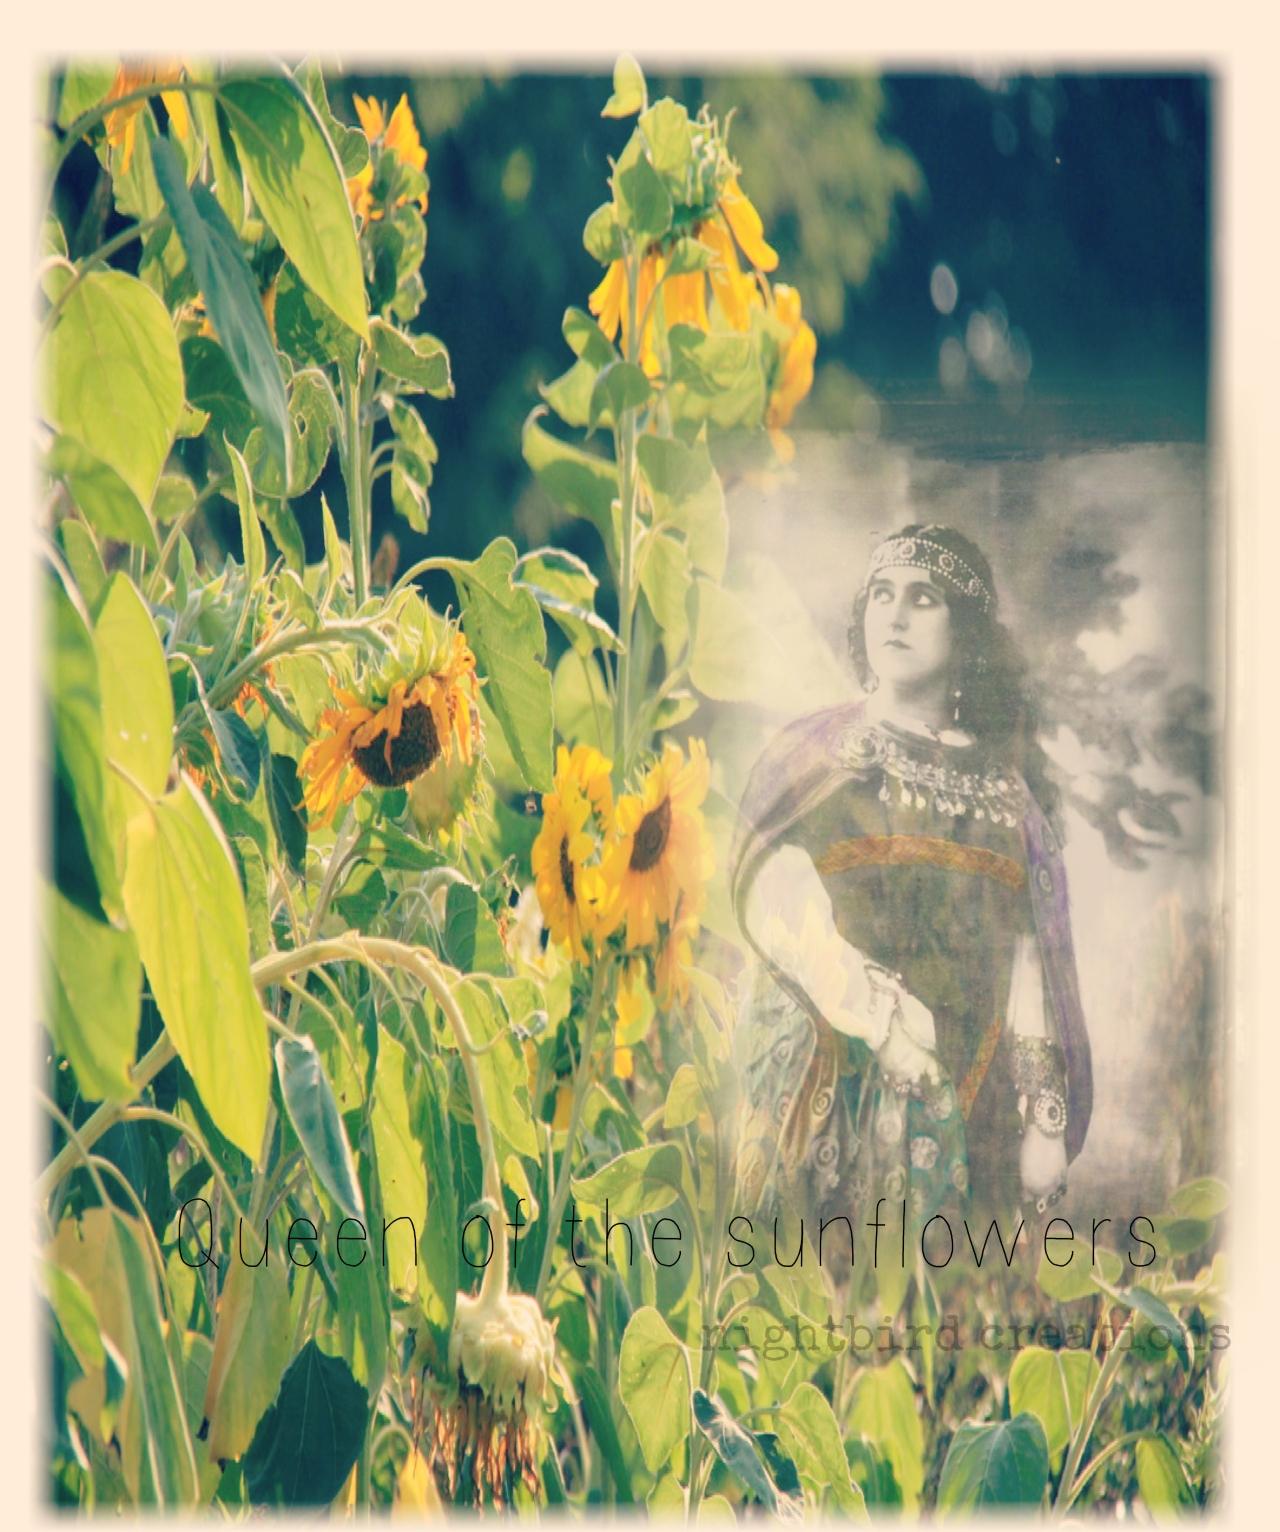 queen of the sunflowers wm